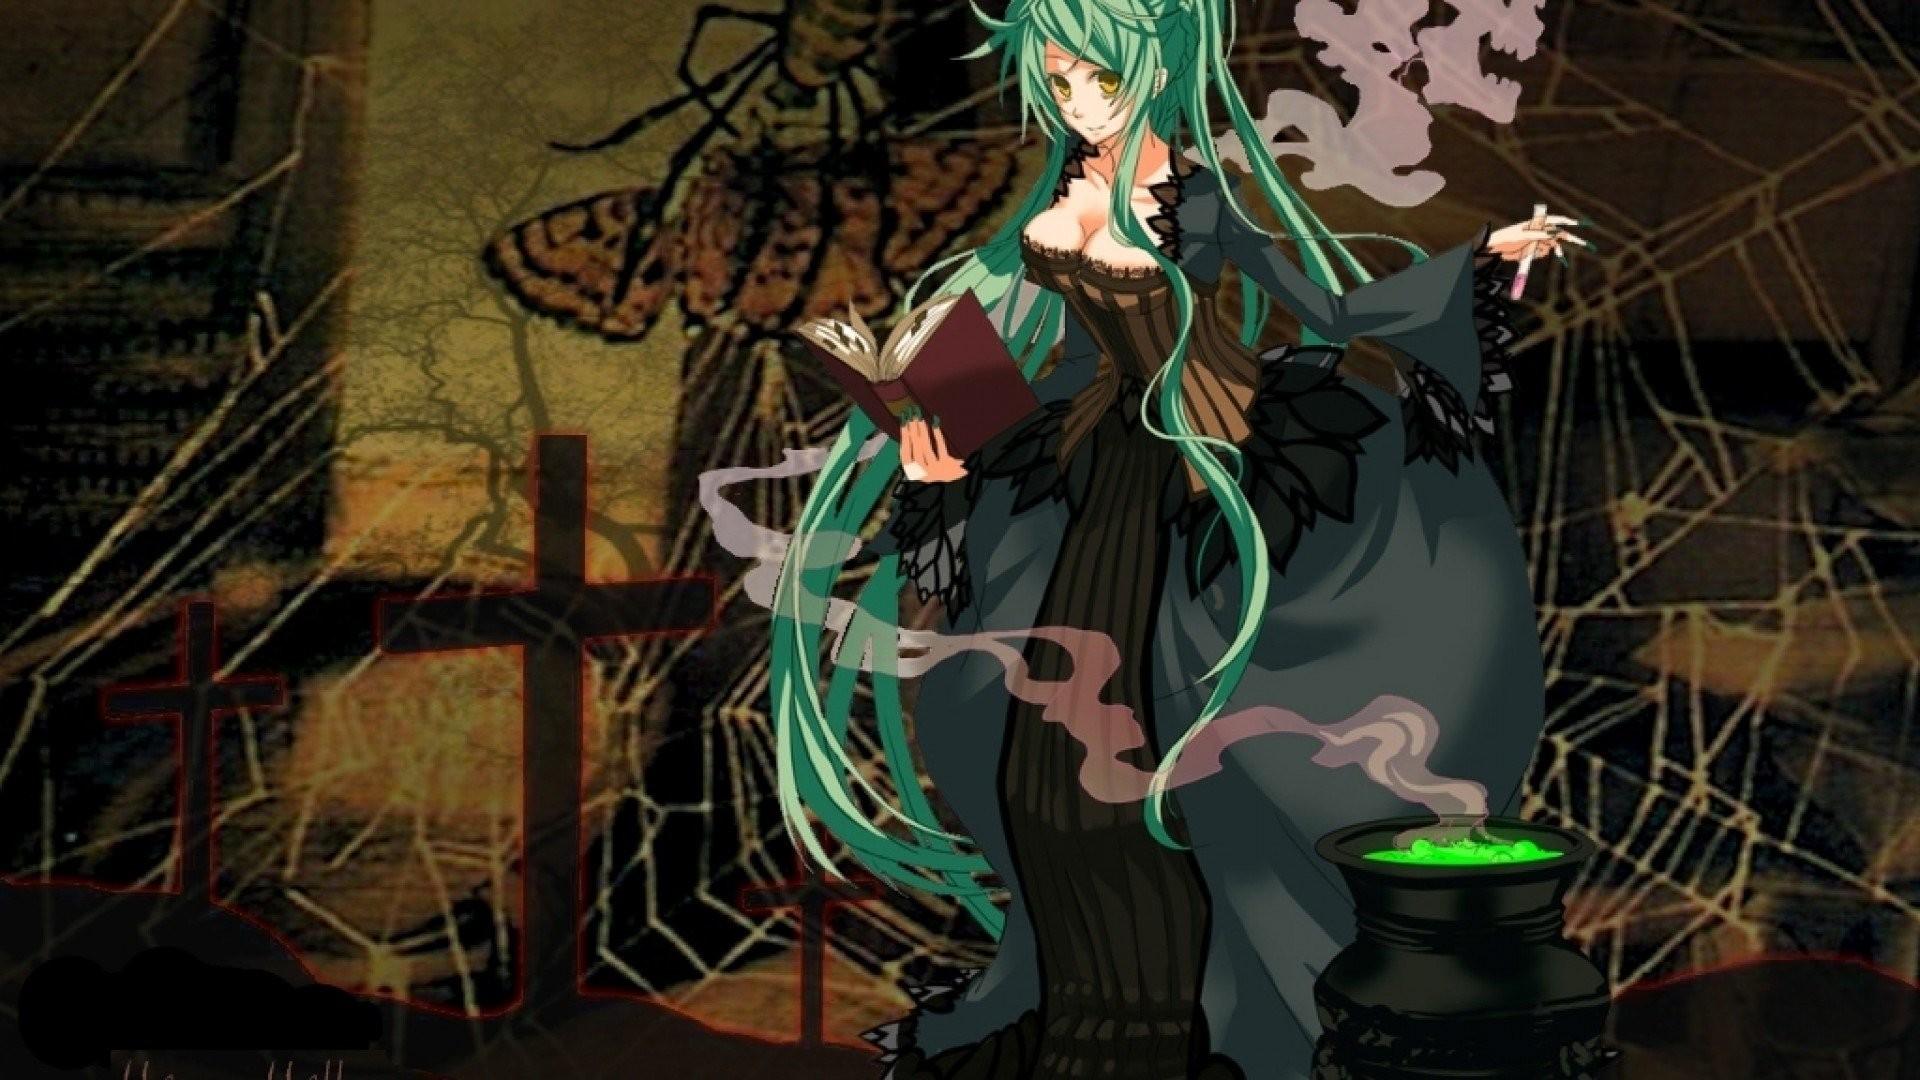 Halloween Wallpaper Halloween Witch - Anime Wallpapers Full Hd Halloween - HD Wallpaper